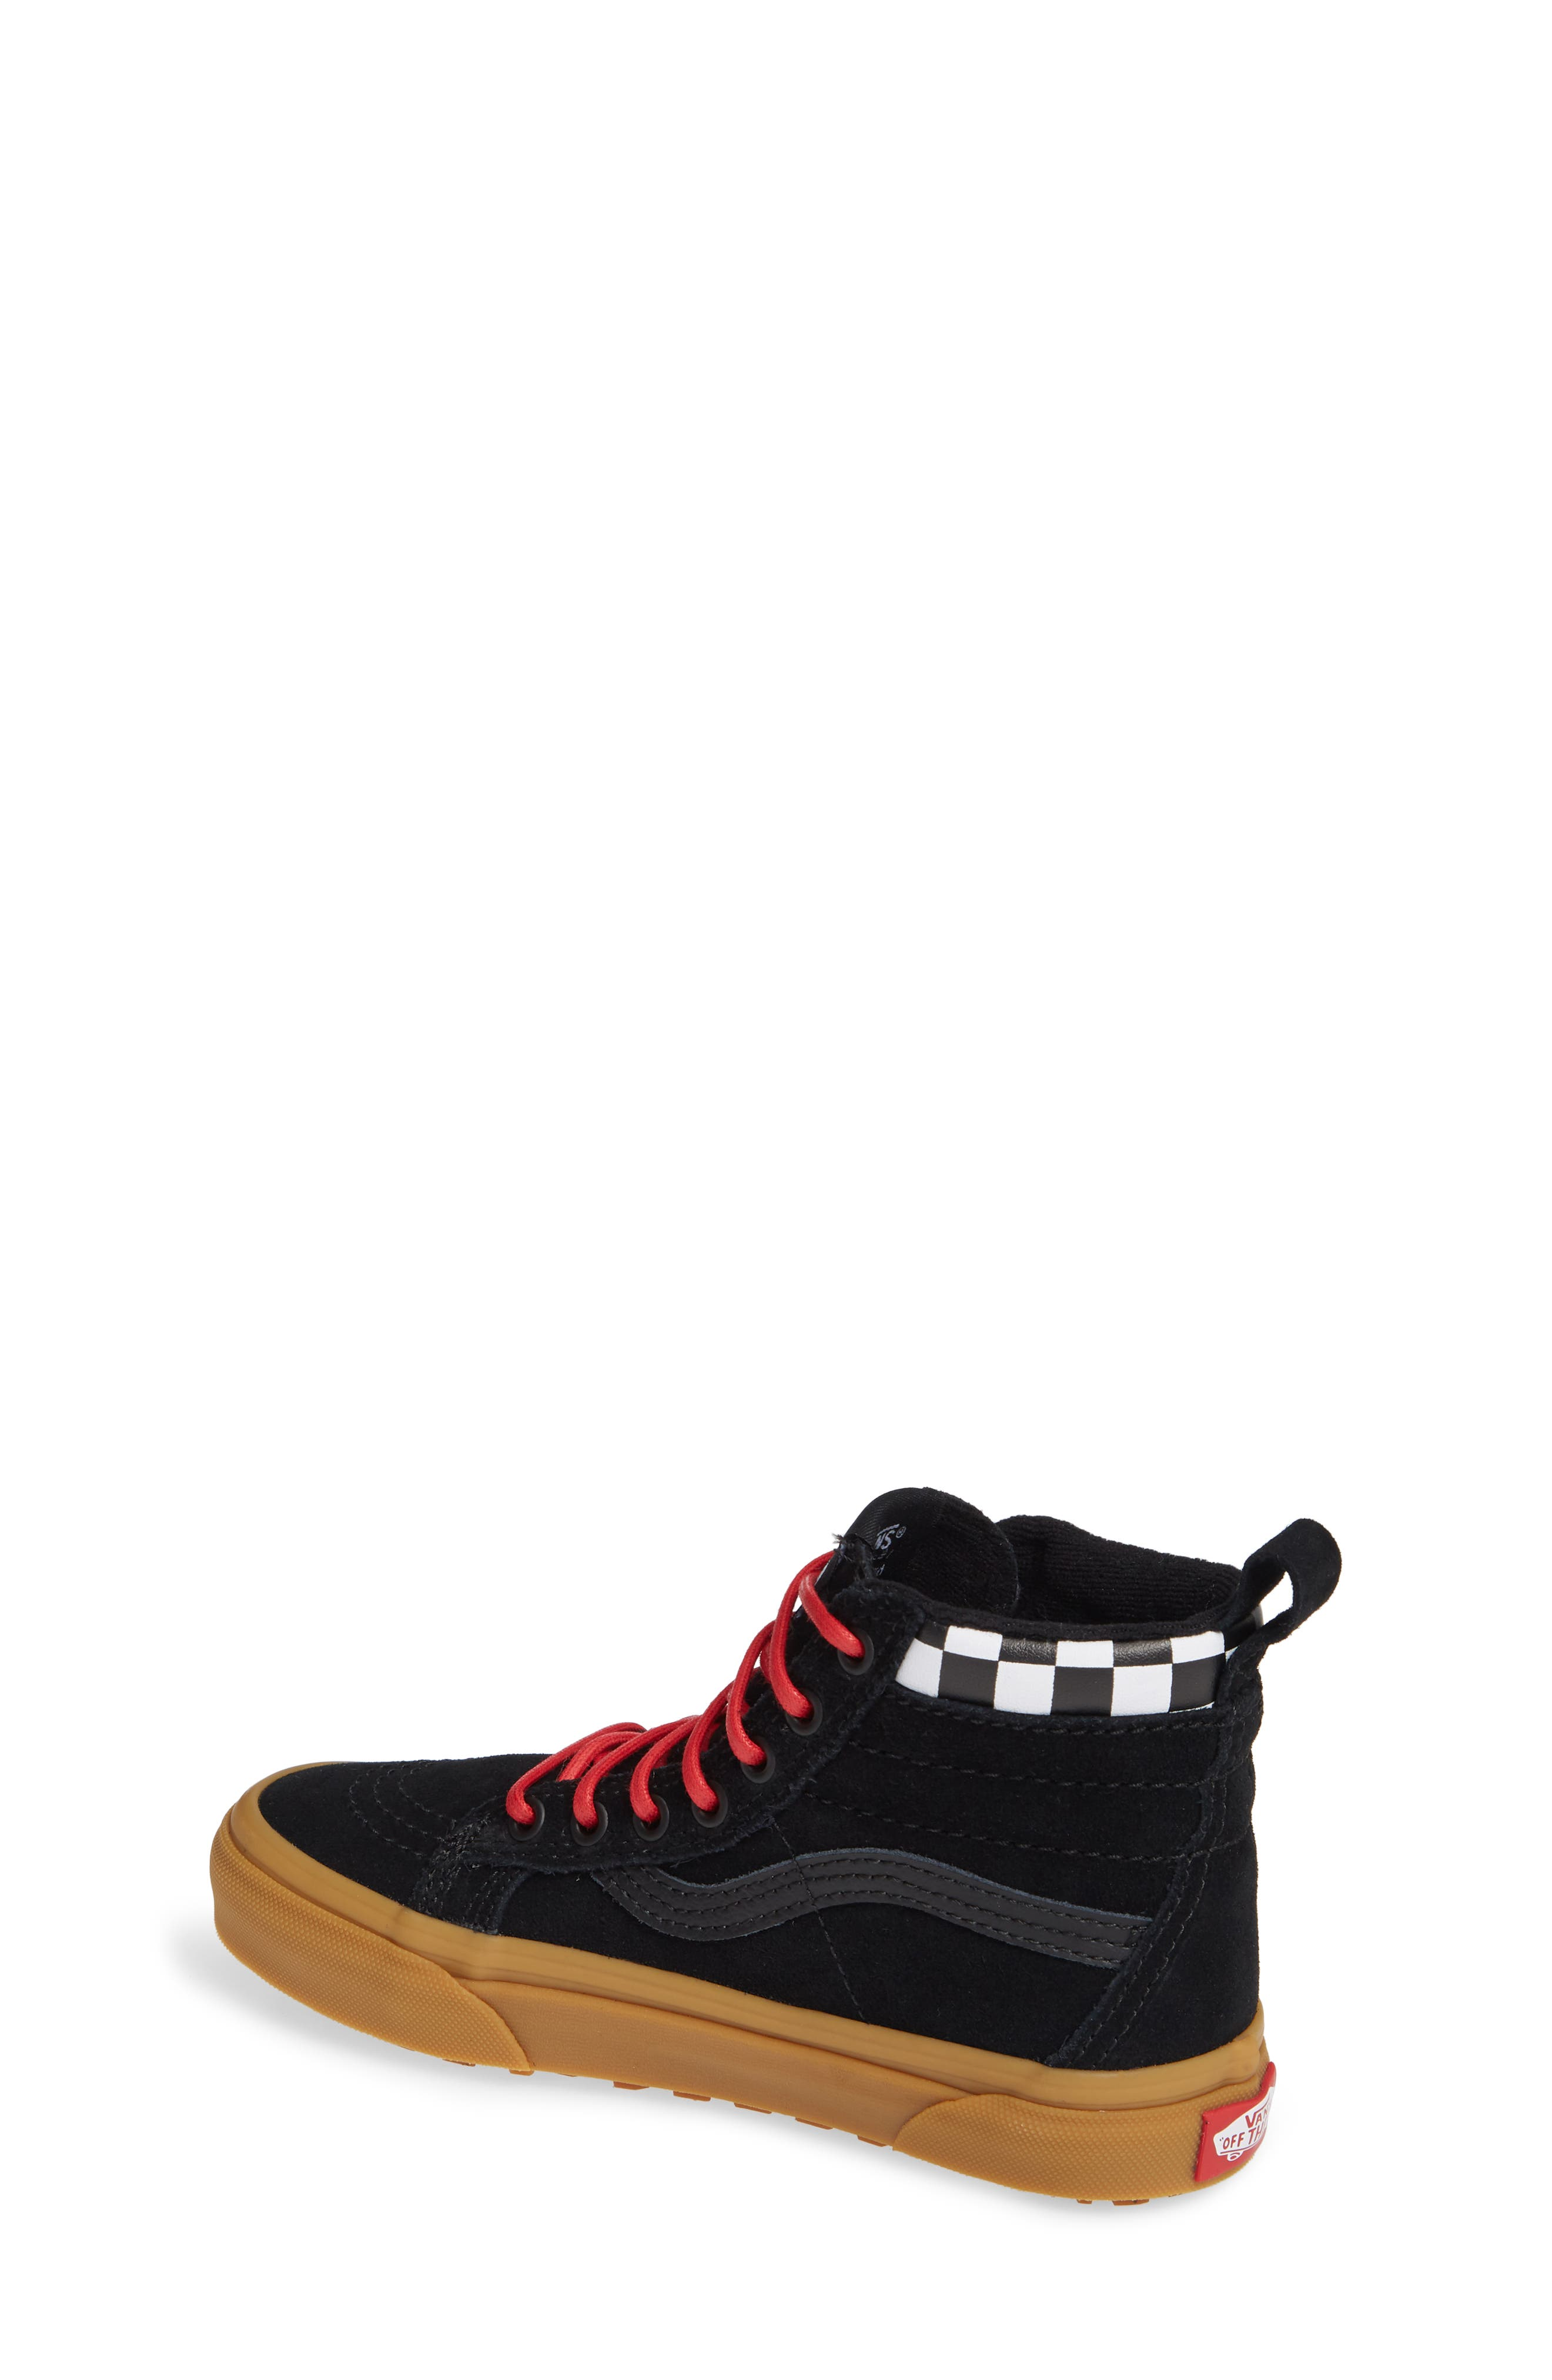 SK8-Hi Sneaker,                             Alternate thumbnail 2, color,                             CHECKERBOARD/ BLACK